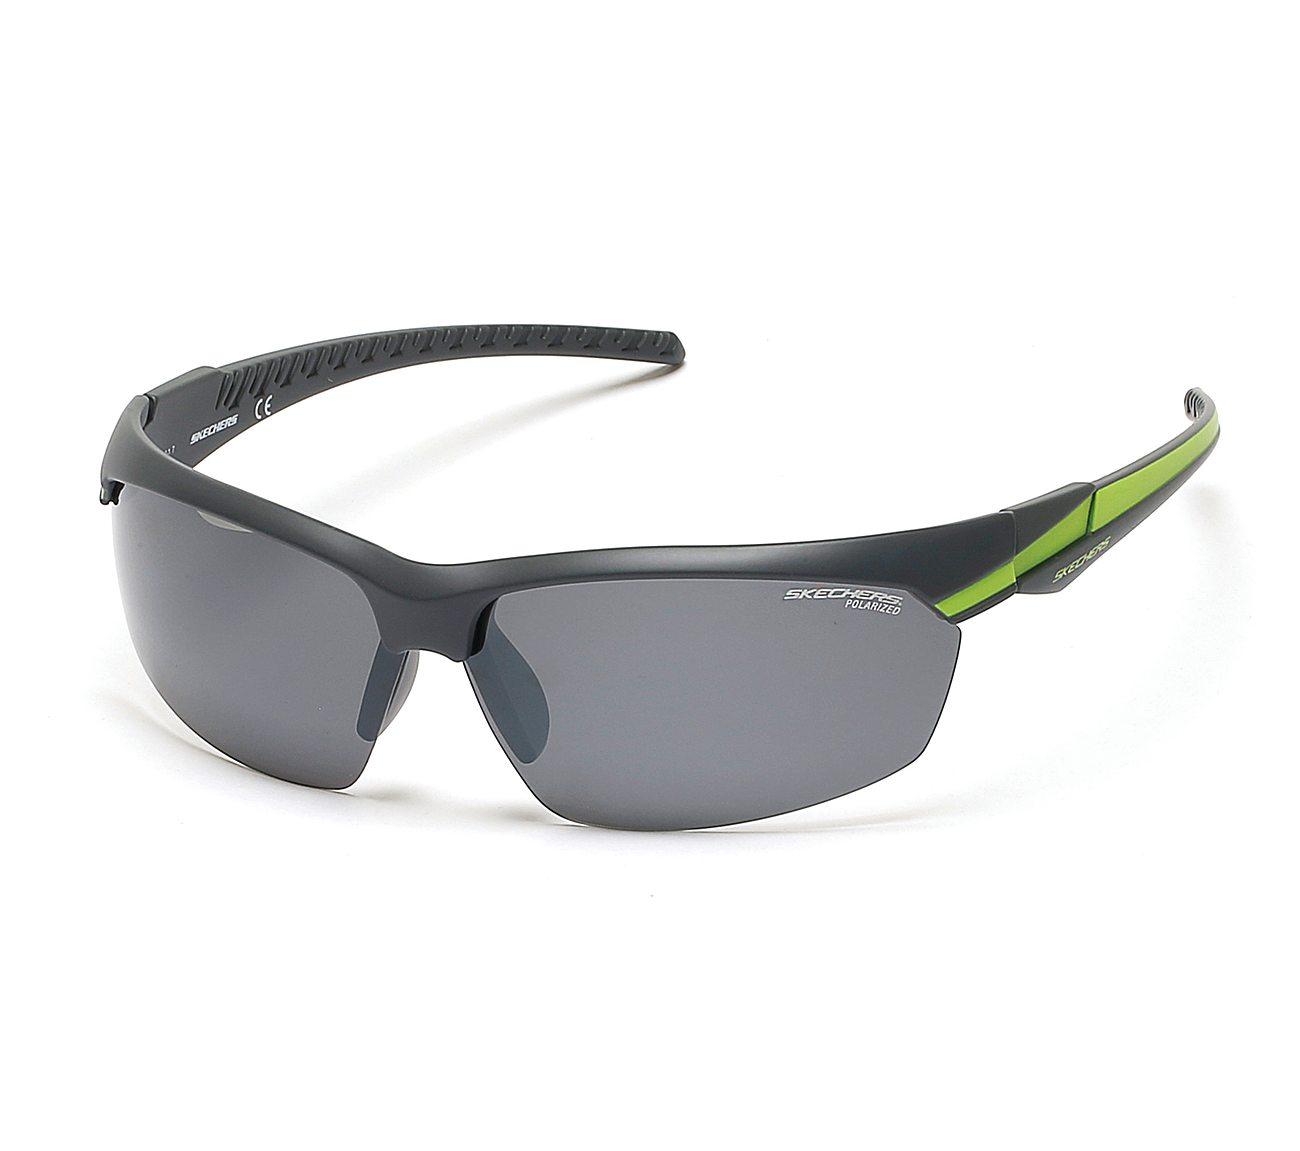 Sport Wrap Half Rim Sunglasses